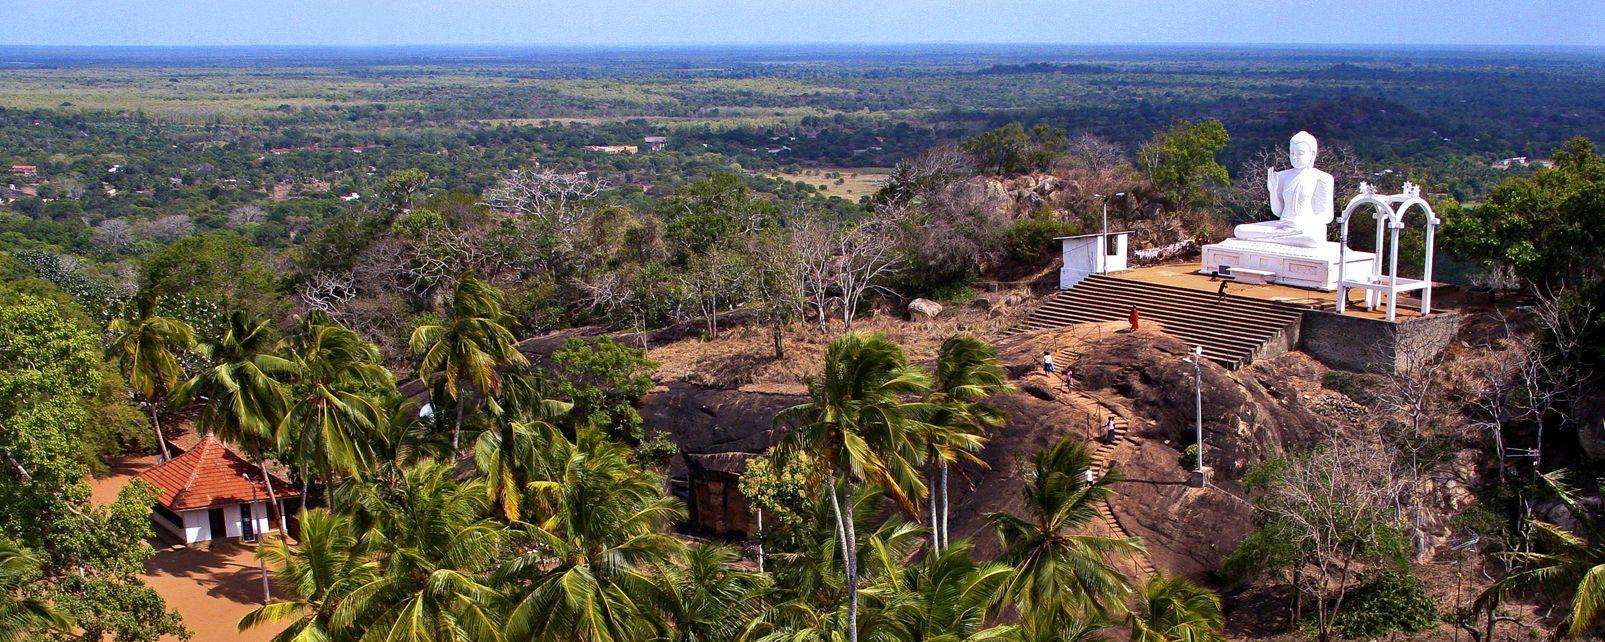 Mihintale , Mihintale, der Berg von Mahinda , Sri Lanka